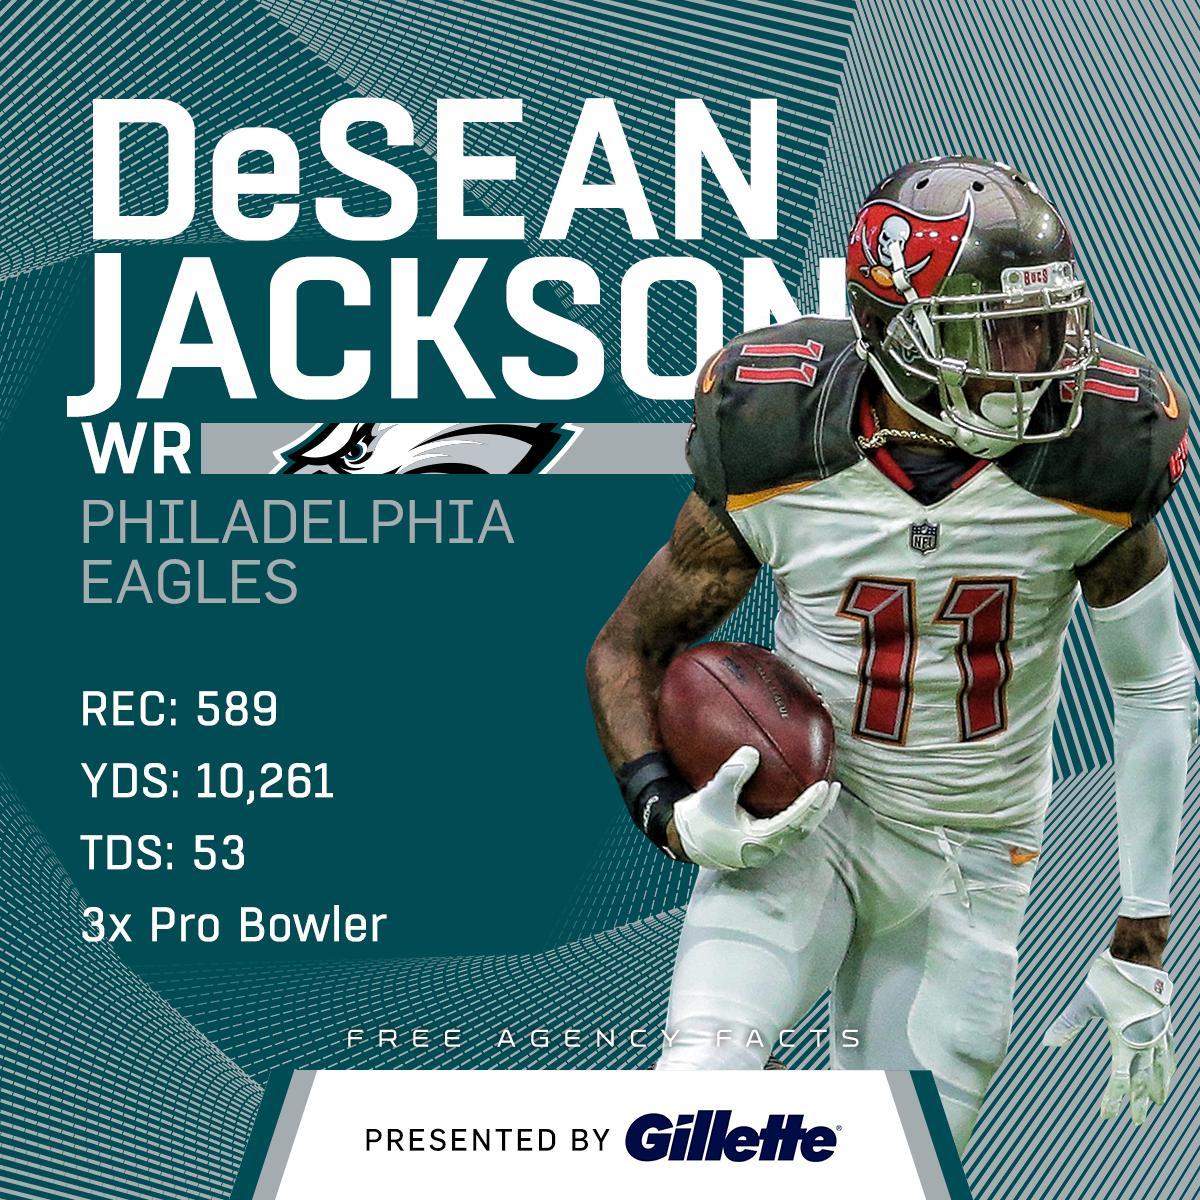 Carson Wentz + @DeSeanJackson11 = How many touchdowns? ��  (by @Gillette) https://t.co/dl9fod6kp7